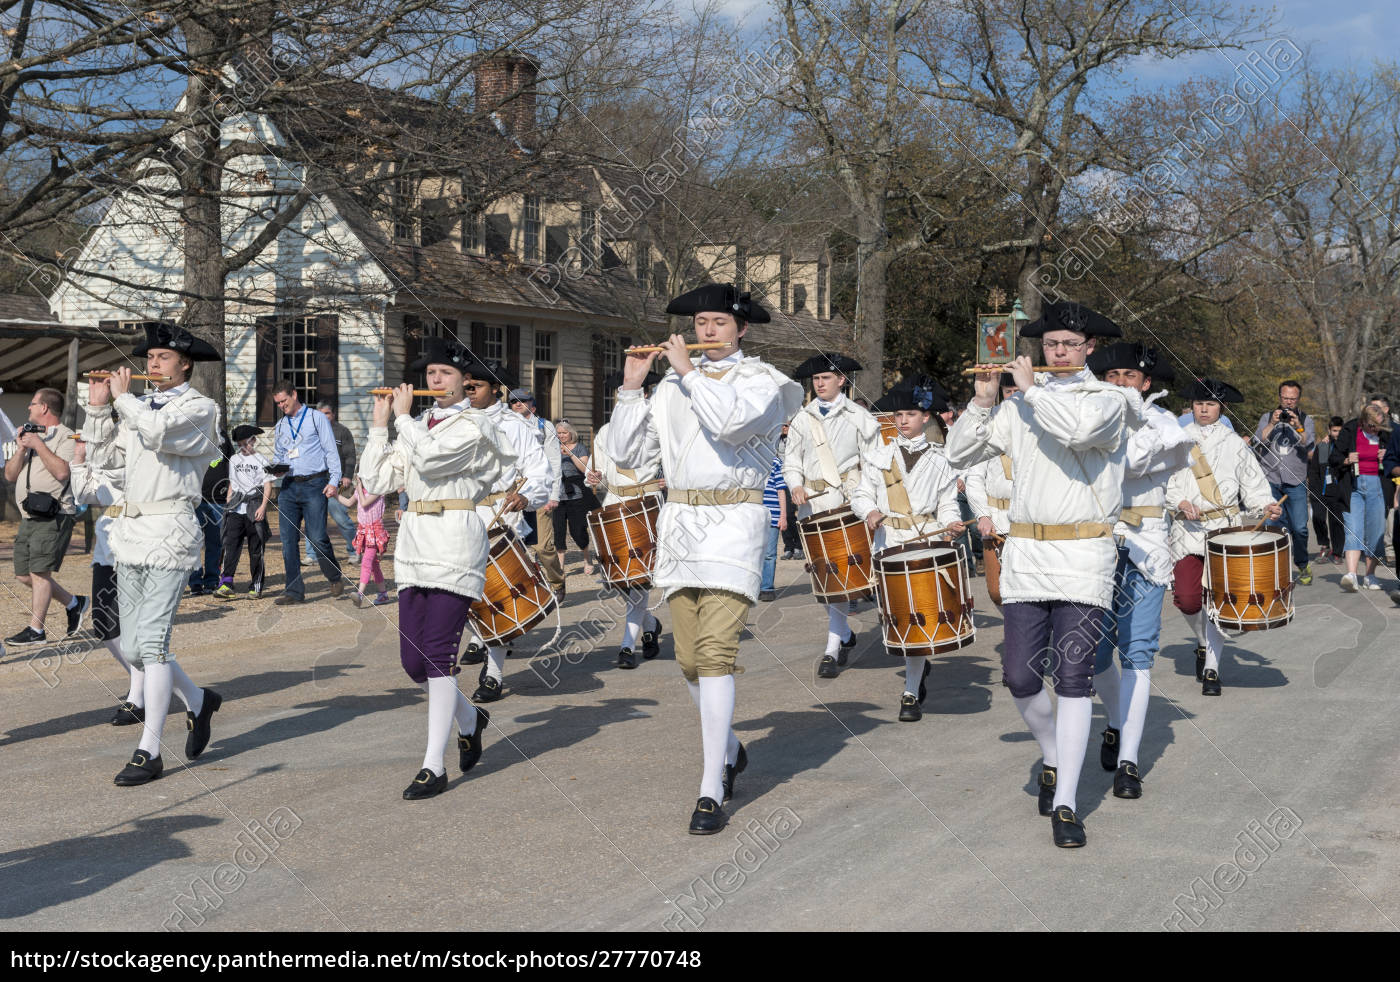 usa, virginia, williamsburg, colonial, williamsburg, fife, und, drum, corps - 27770748